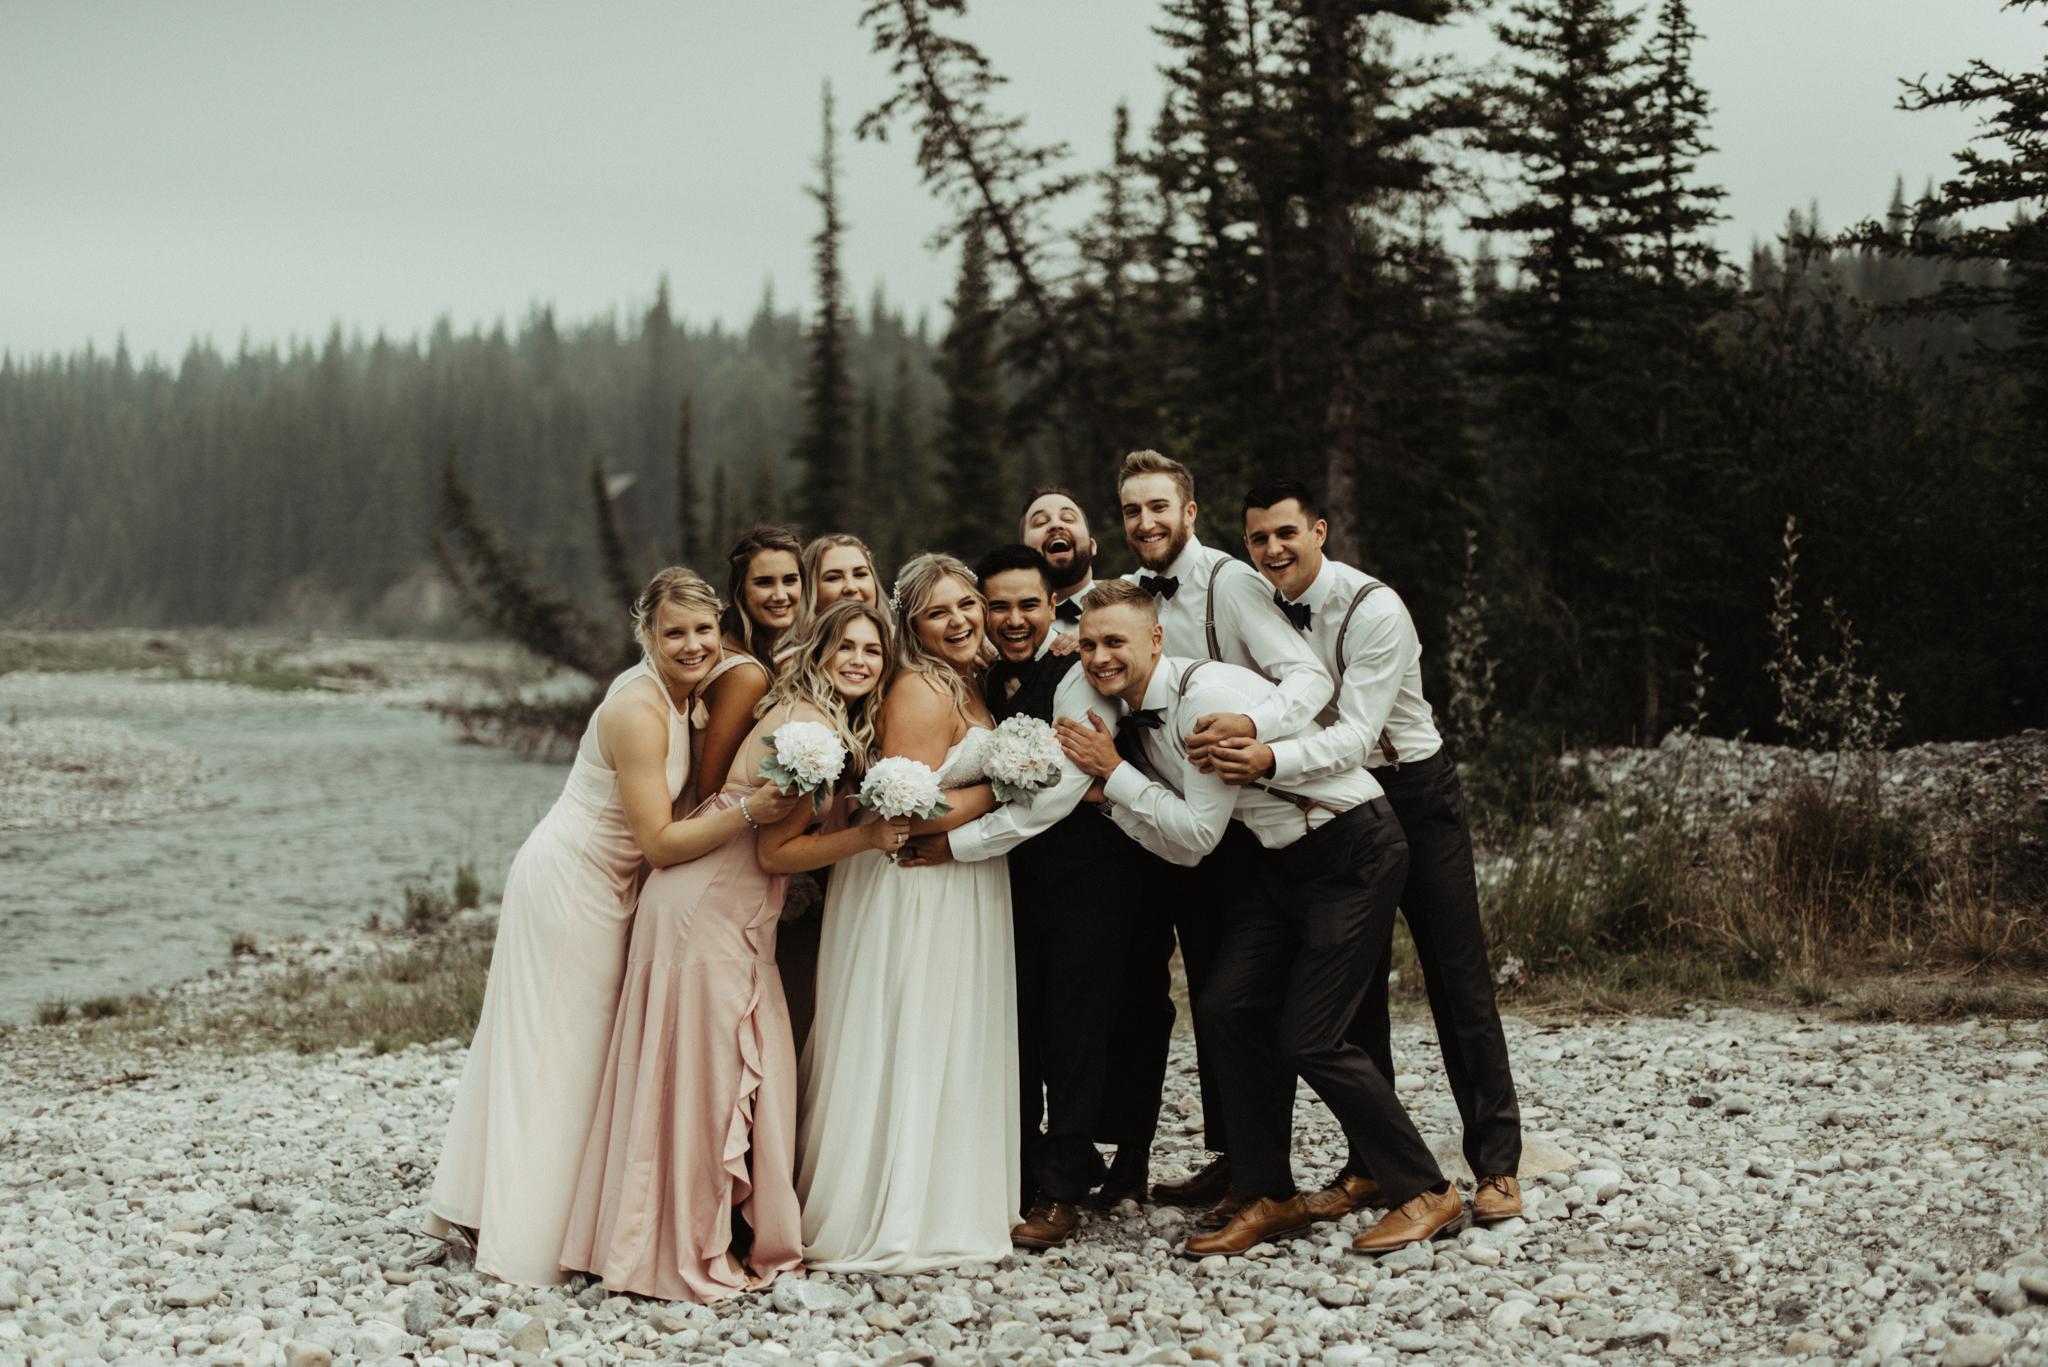 W+J - Calgary Wedding Photographer - Ghost Lake - Rocky Mountain Wedding-55.jpg